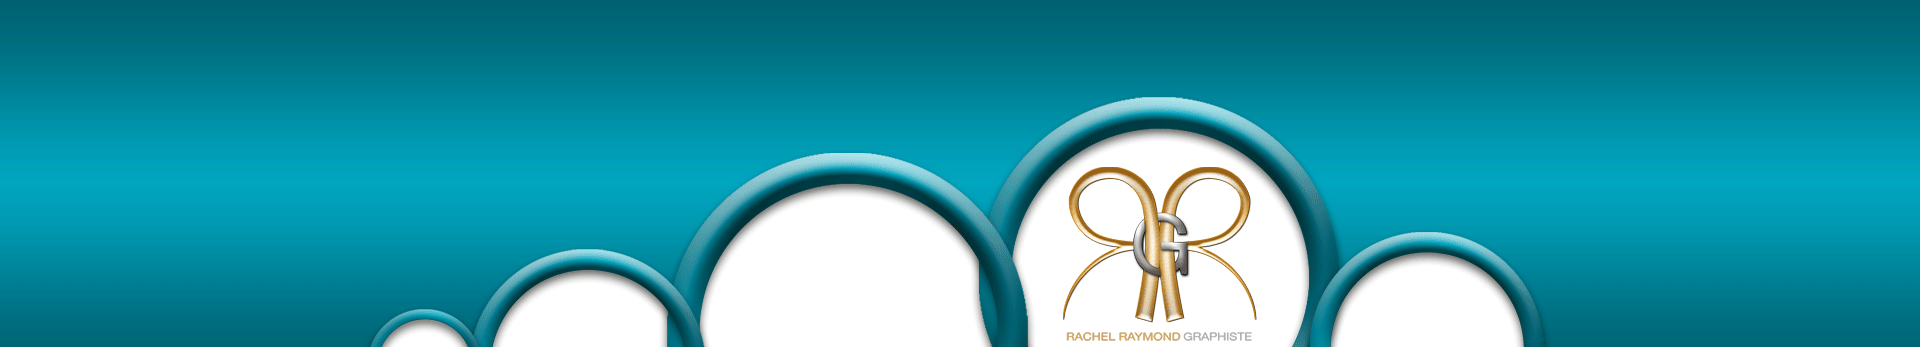 Rachel Raymond Graphiste